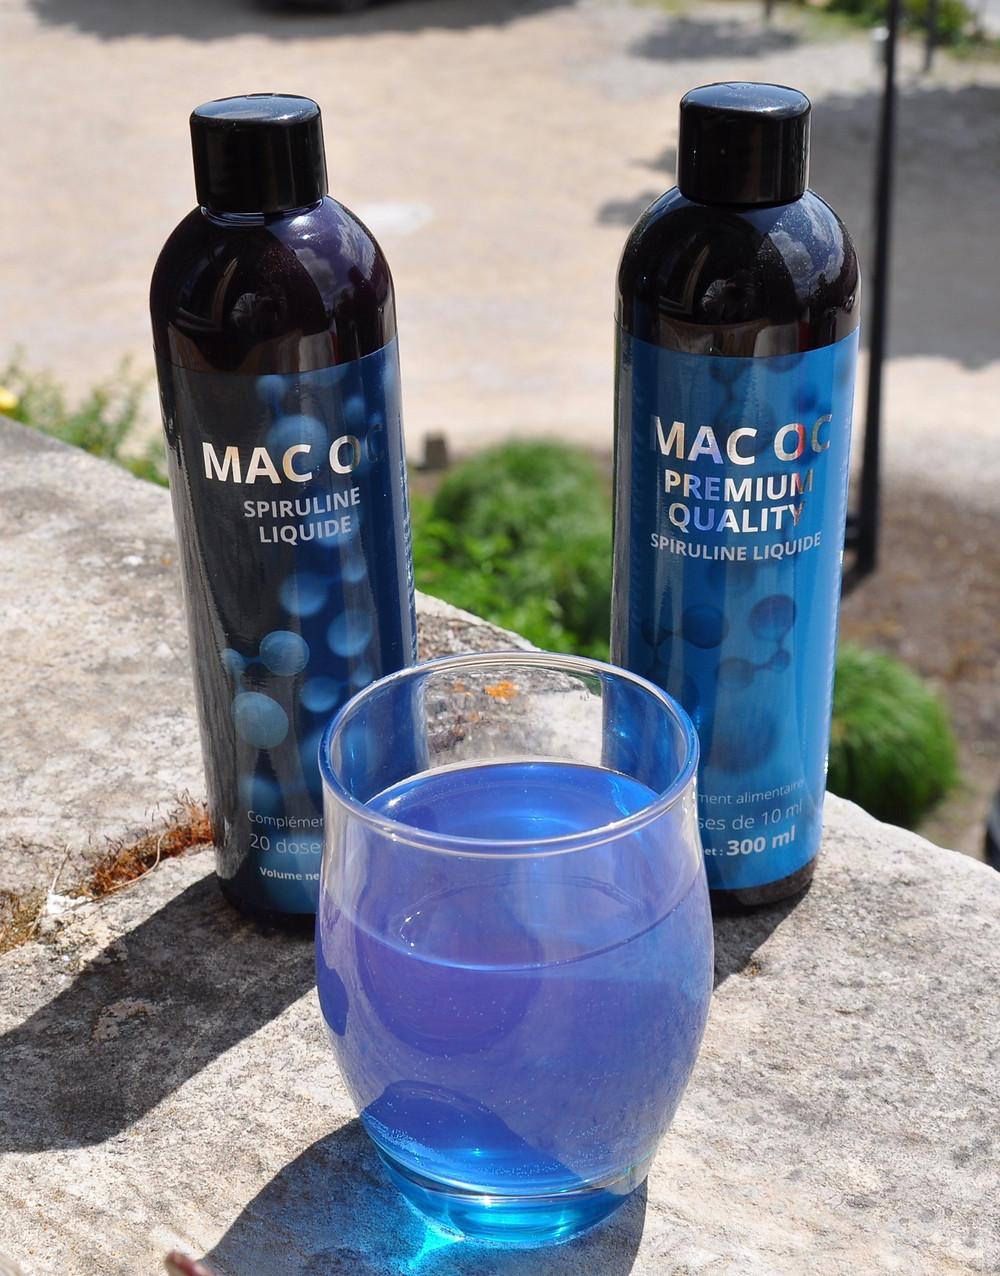 Article Blog Shuhari-Sologne.com La spiruline liquide